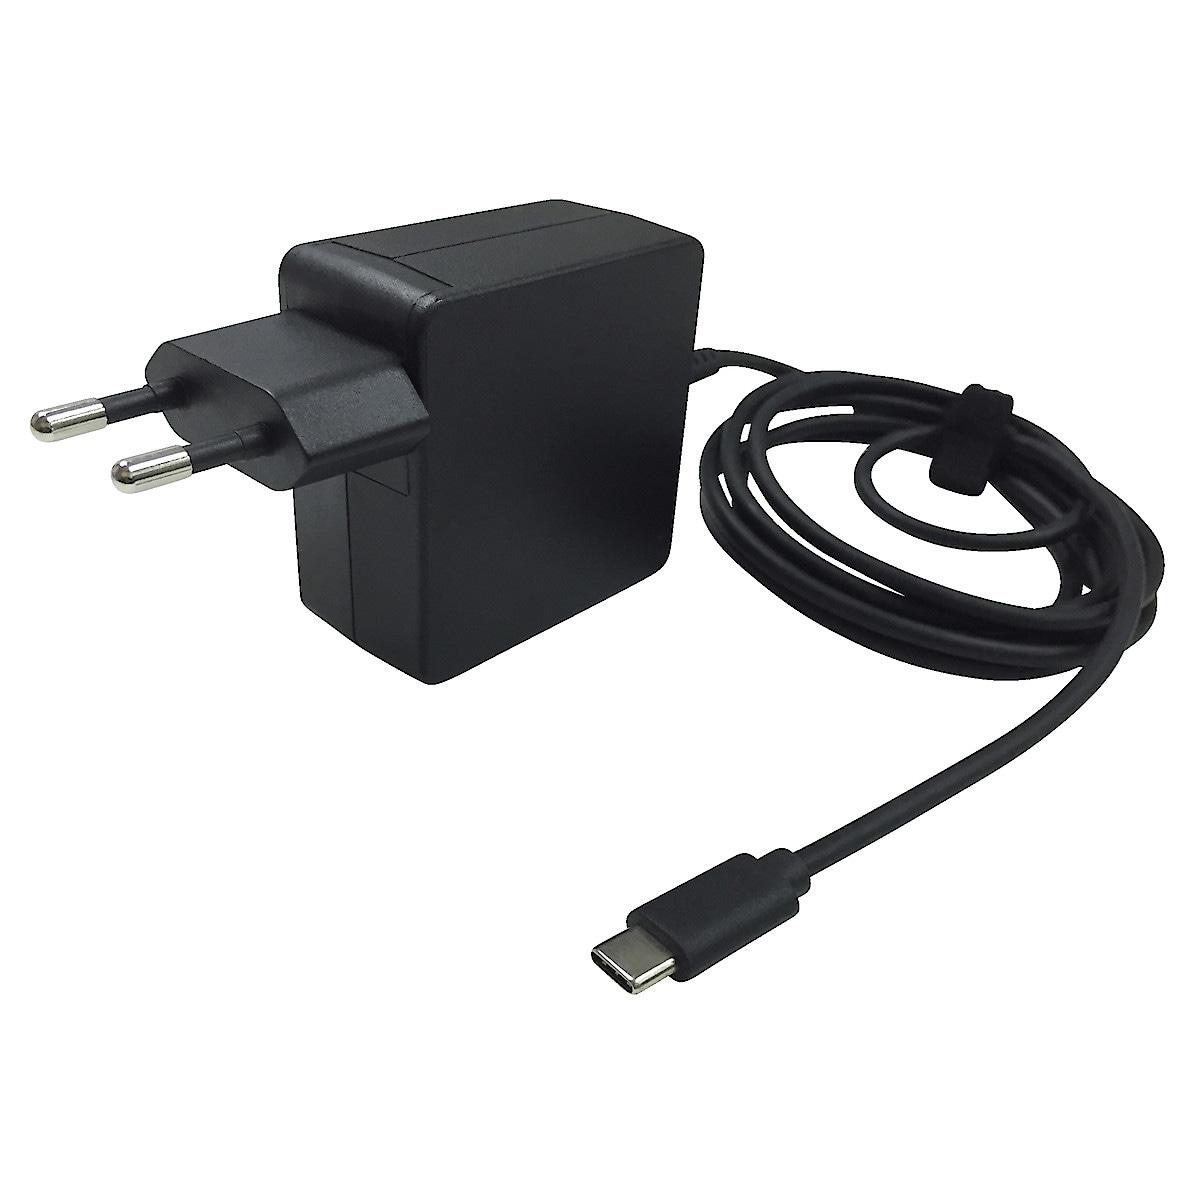 Exibel batterieliminator USB C | Clas Ohlson